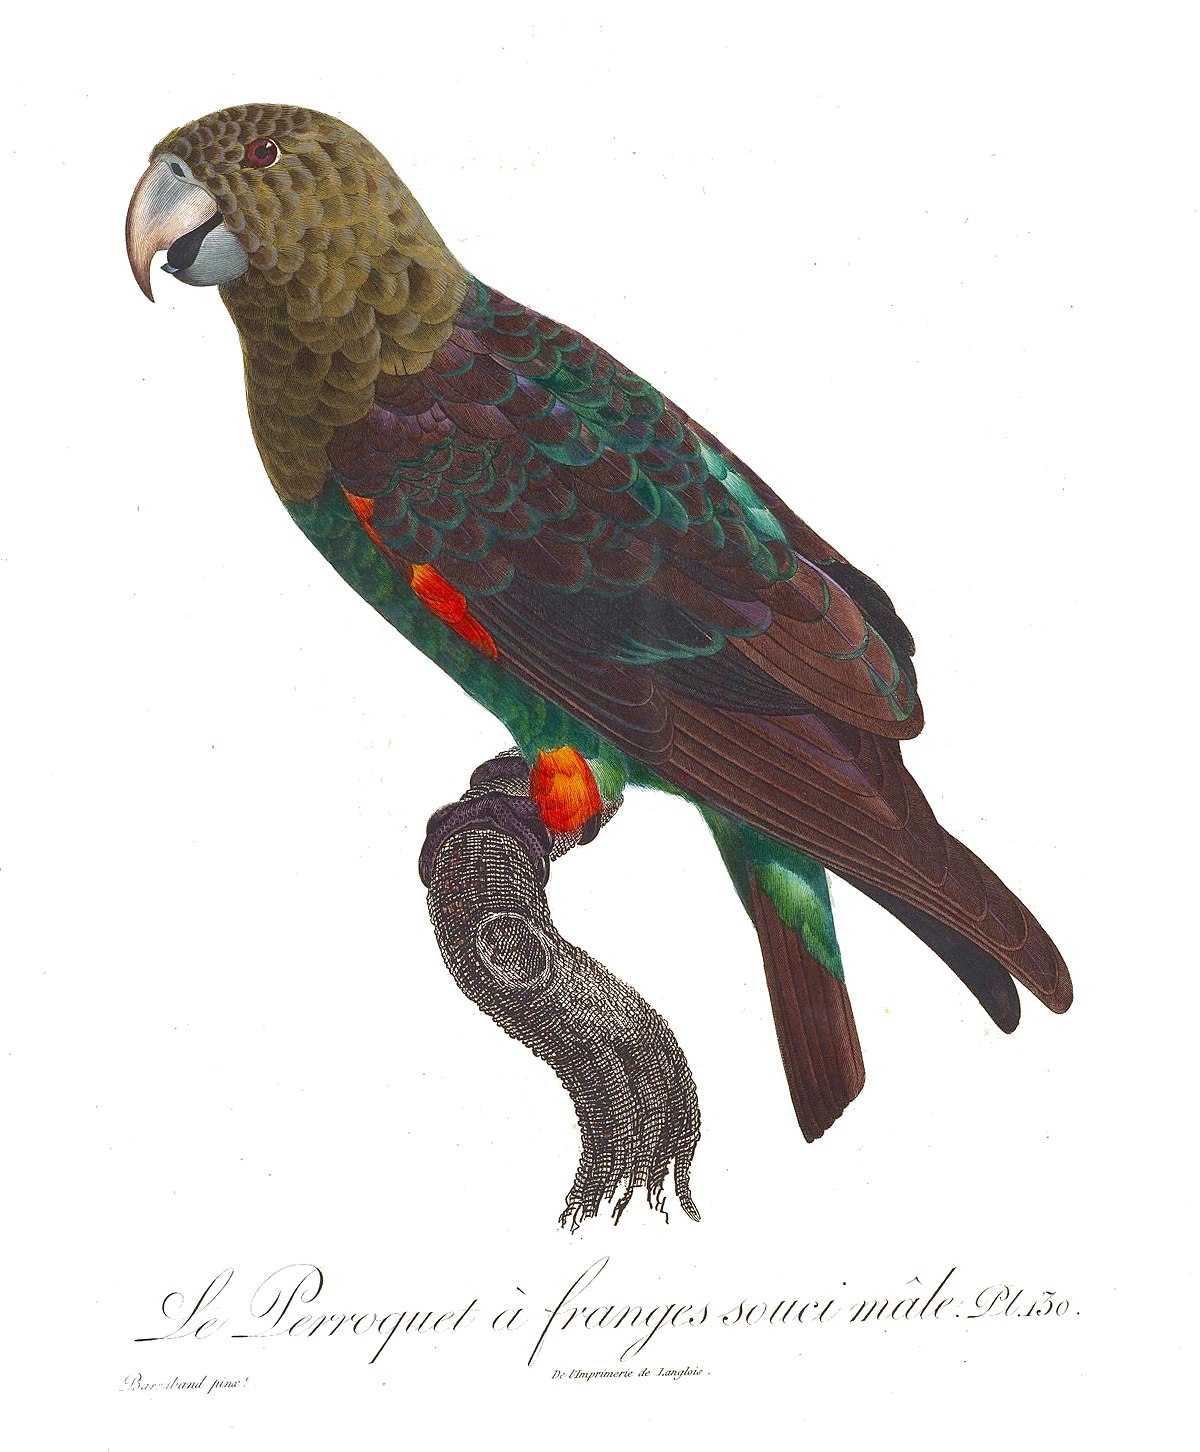 Beigehuvad papegoja wikipedia for Histoire des jardins wikipedia